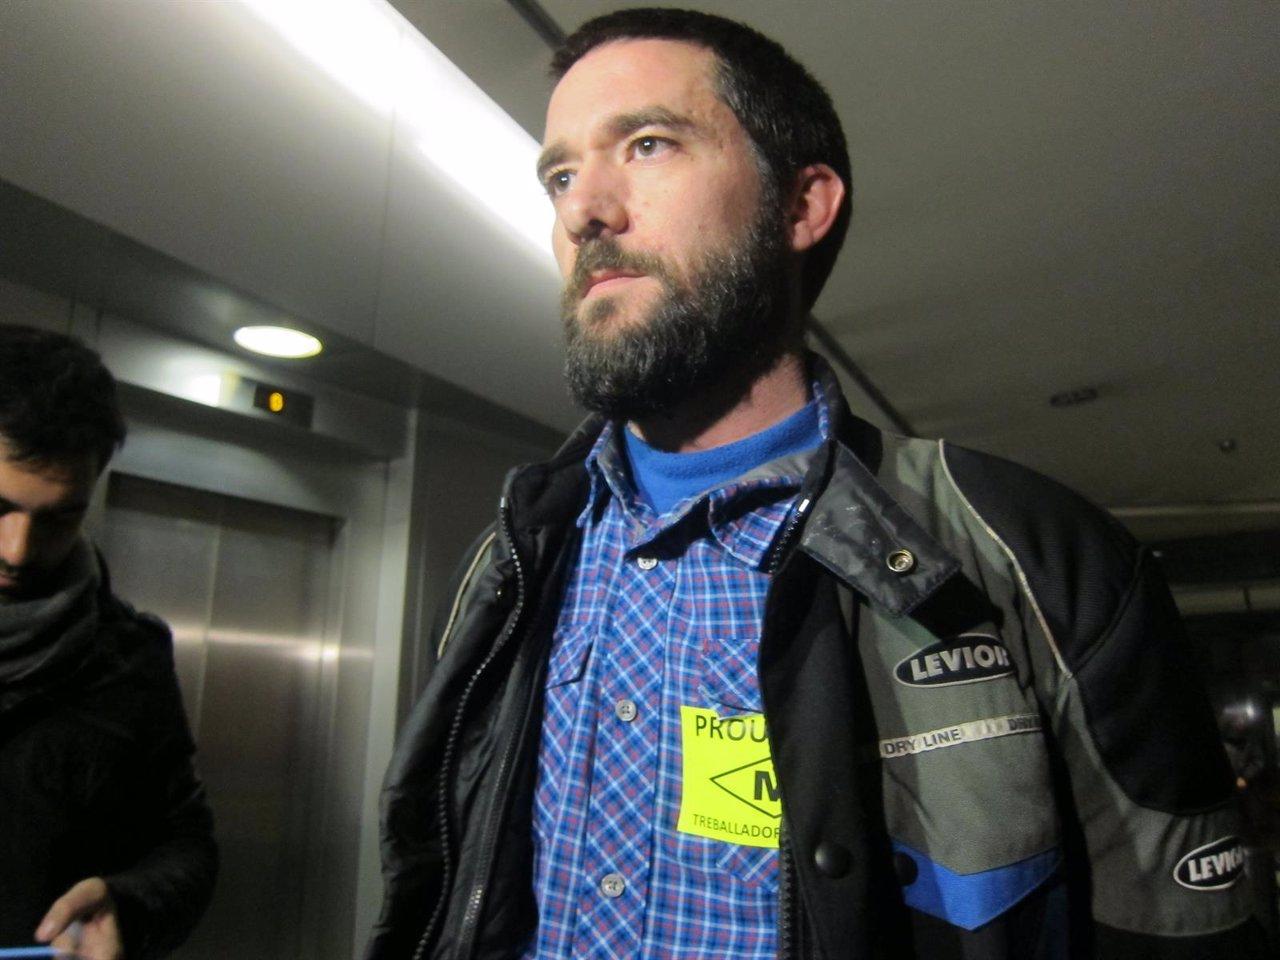 El portavoz del comité de huelga, Óscar Sánchez